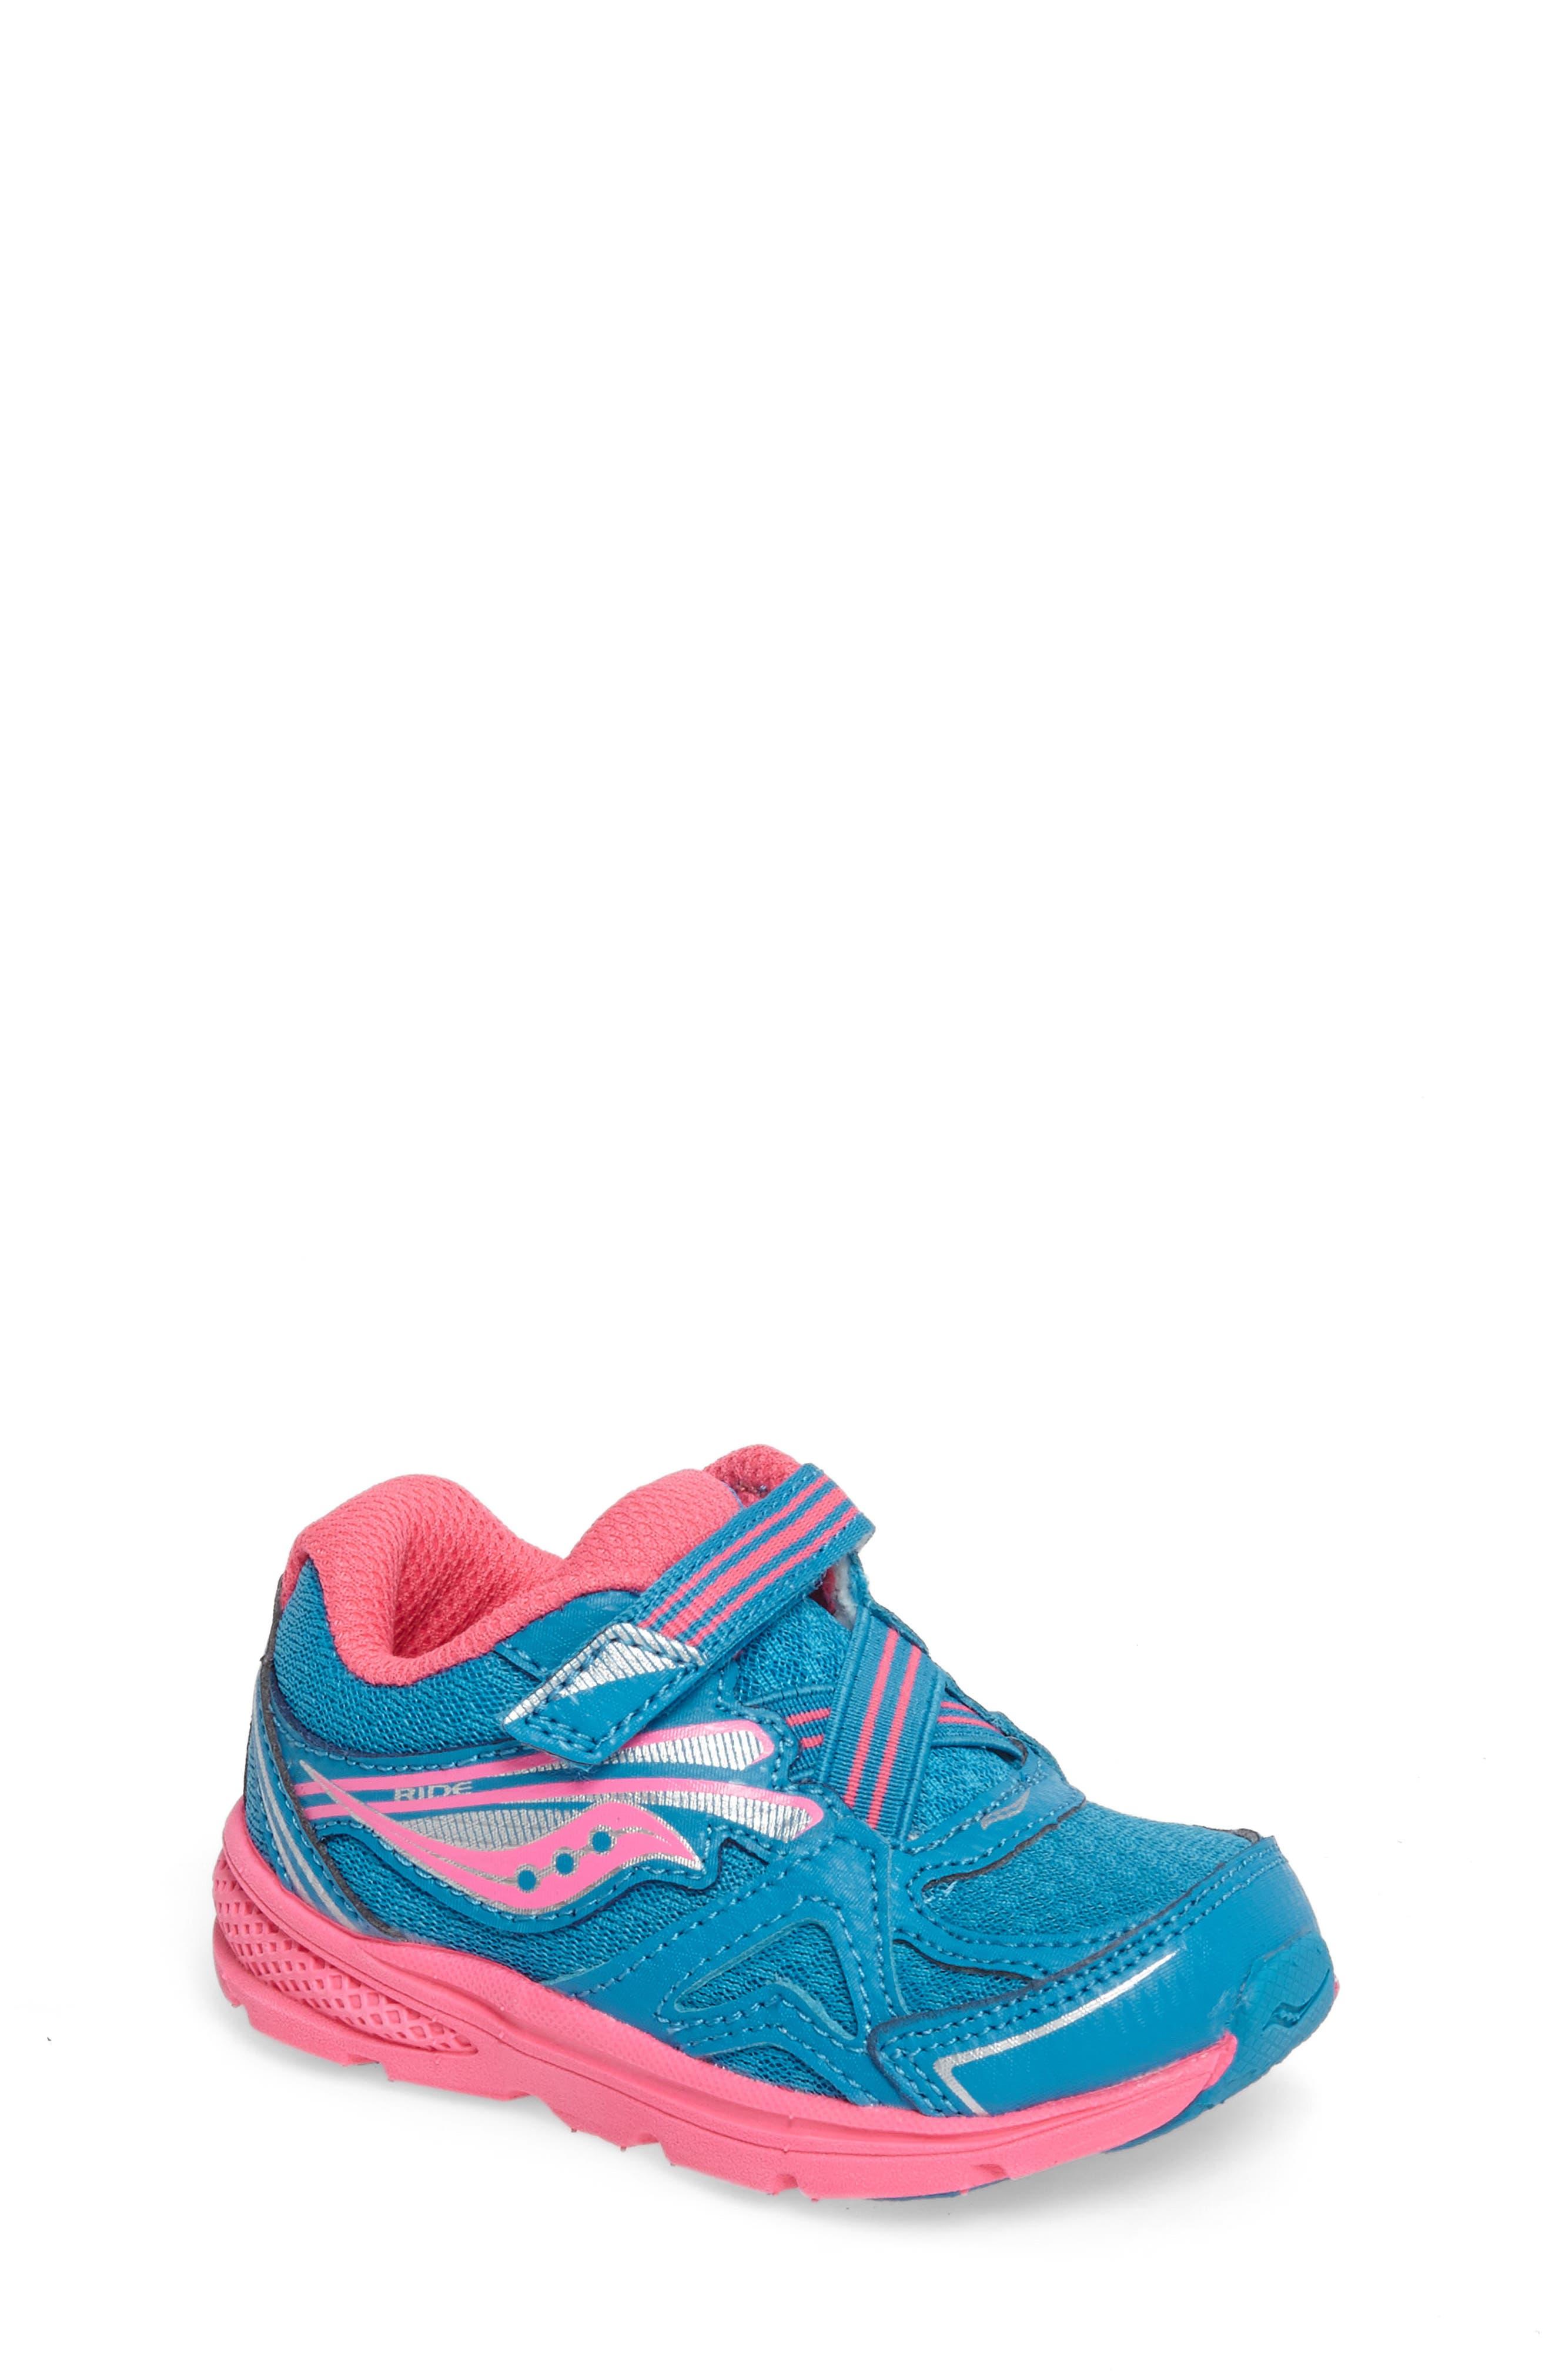 'Baby Ride' Sneaker,                             Main thumbnail 1, color,                             401